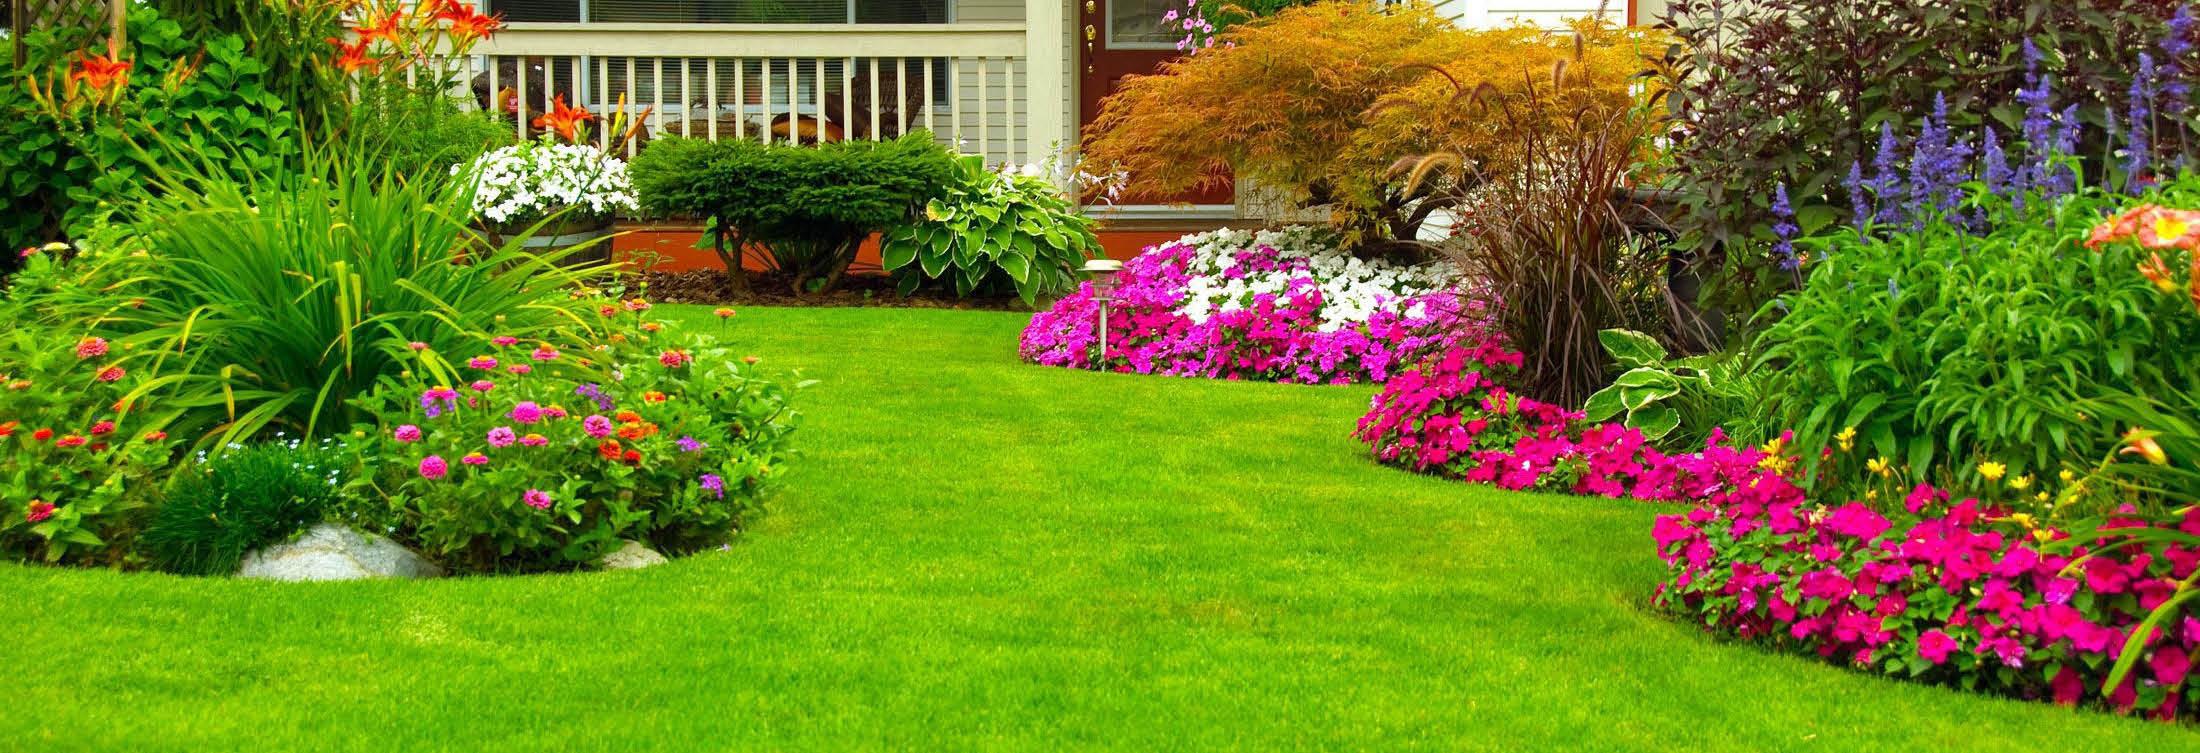 Galvans Lawn & Landscape Banner Image